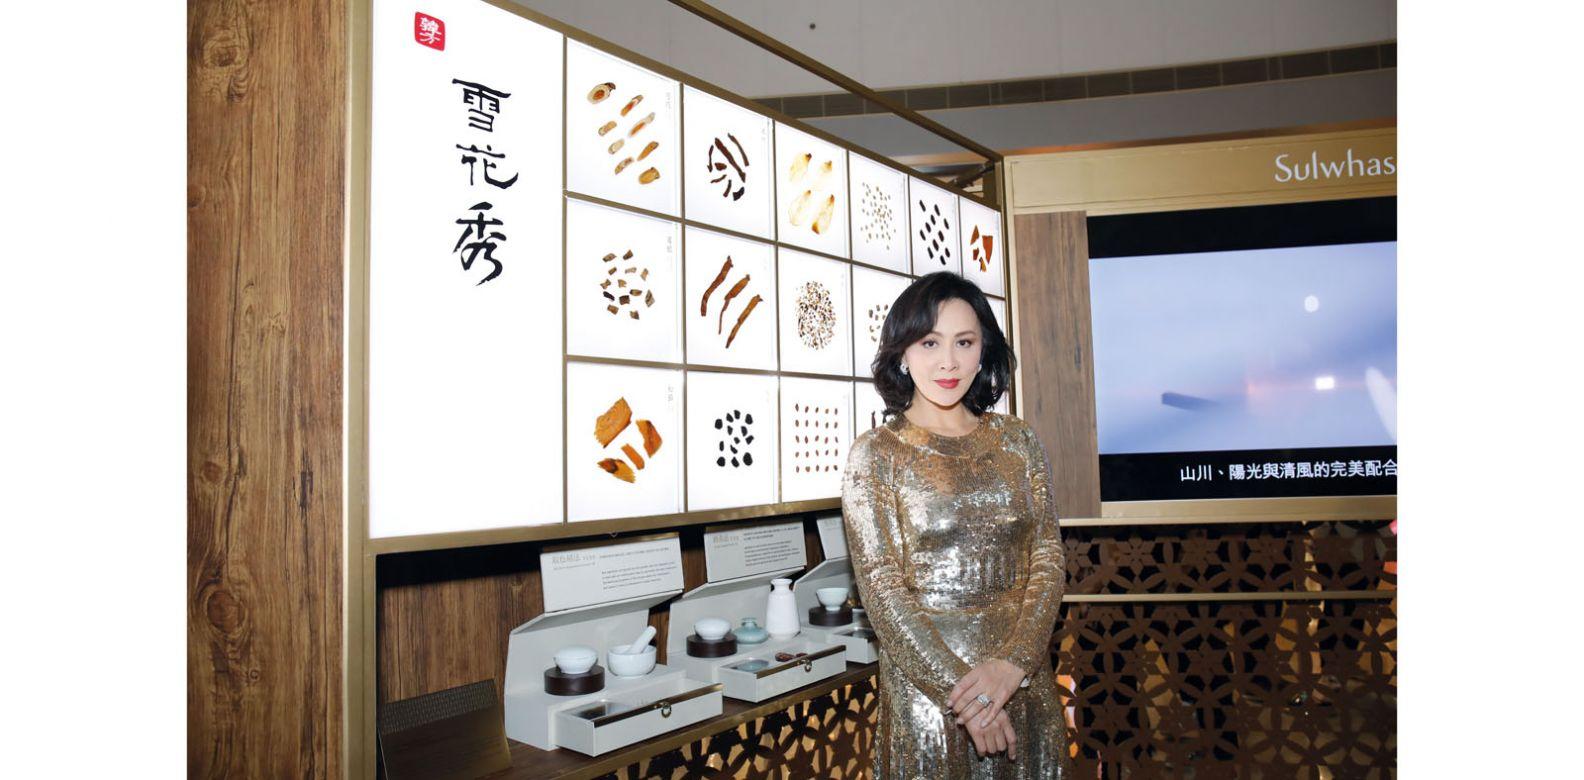 Hong Kong celebrities Carina Lau